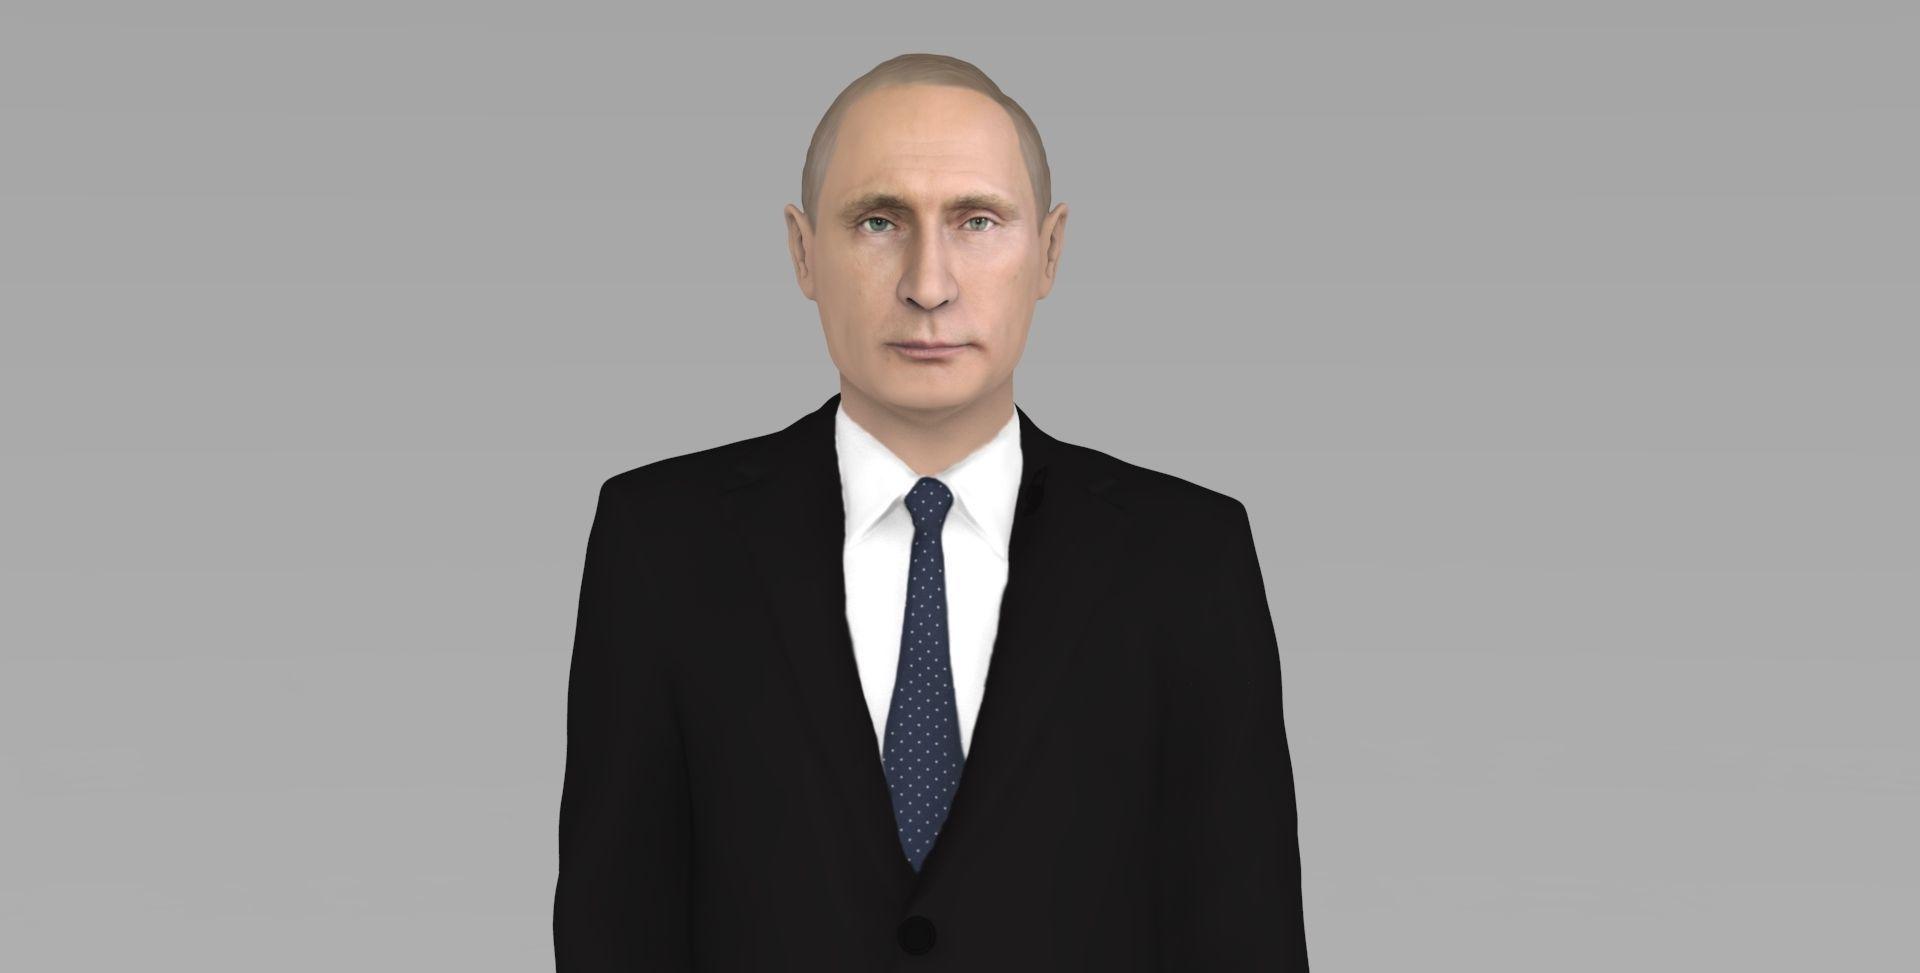 Vladimir Putin ready for full color 3D printing